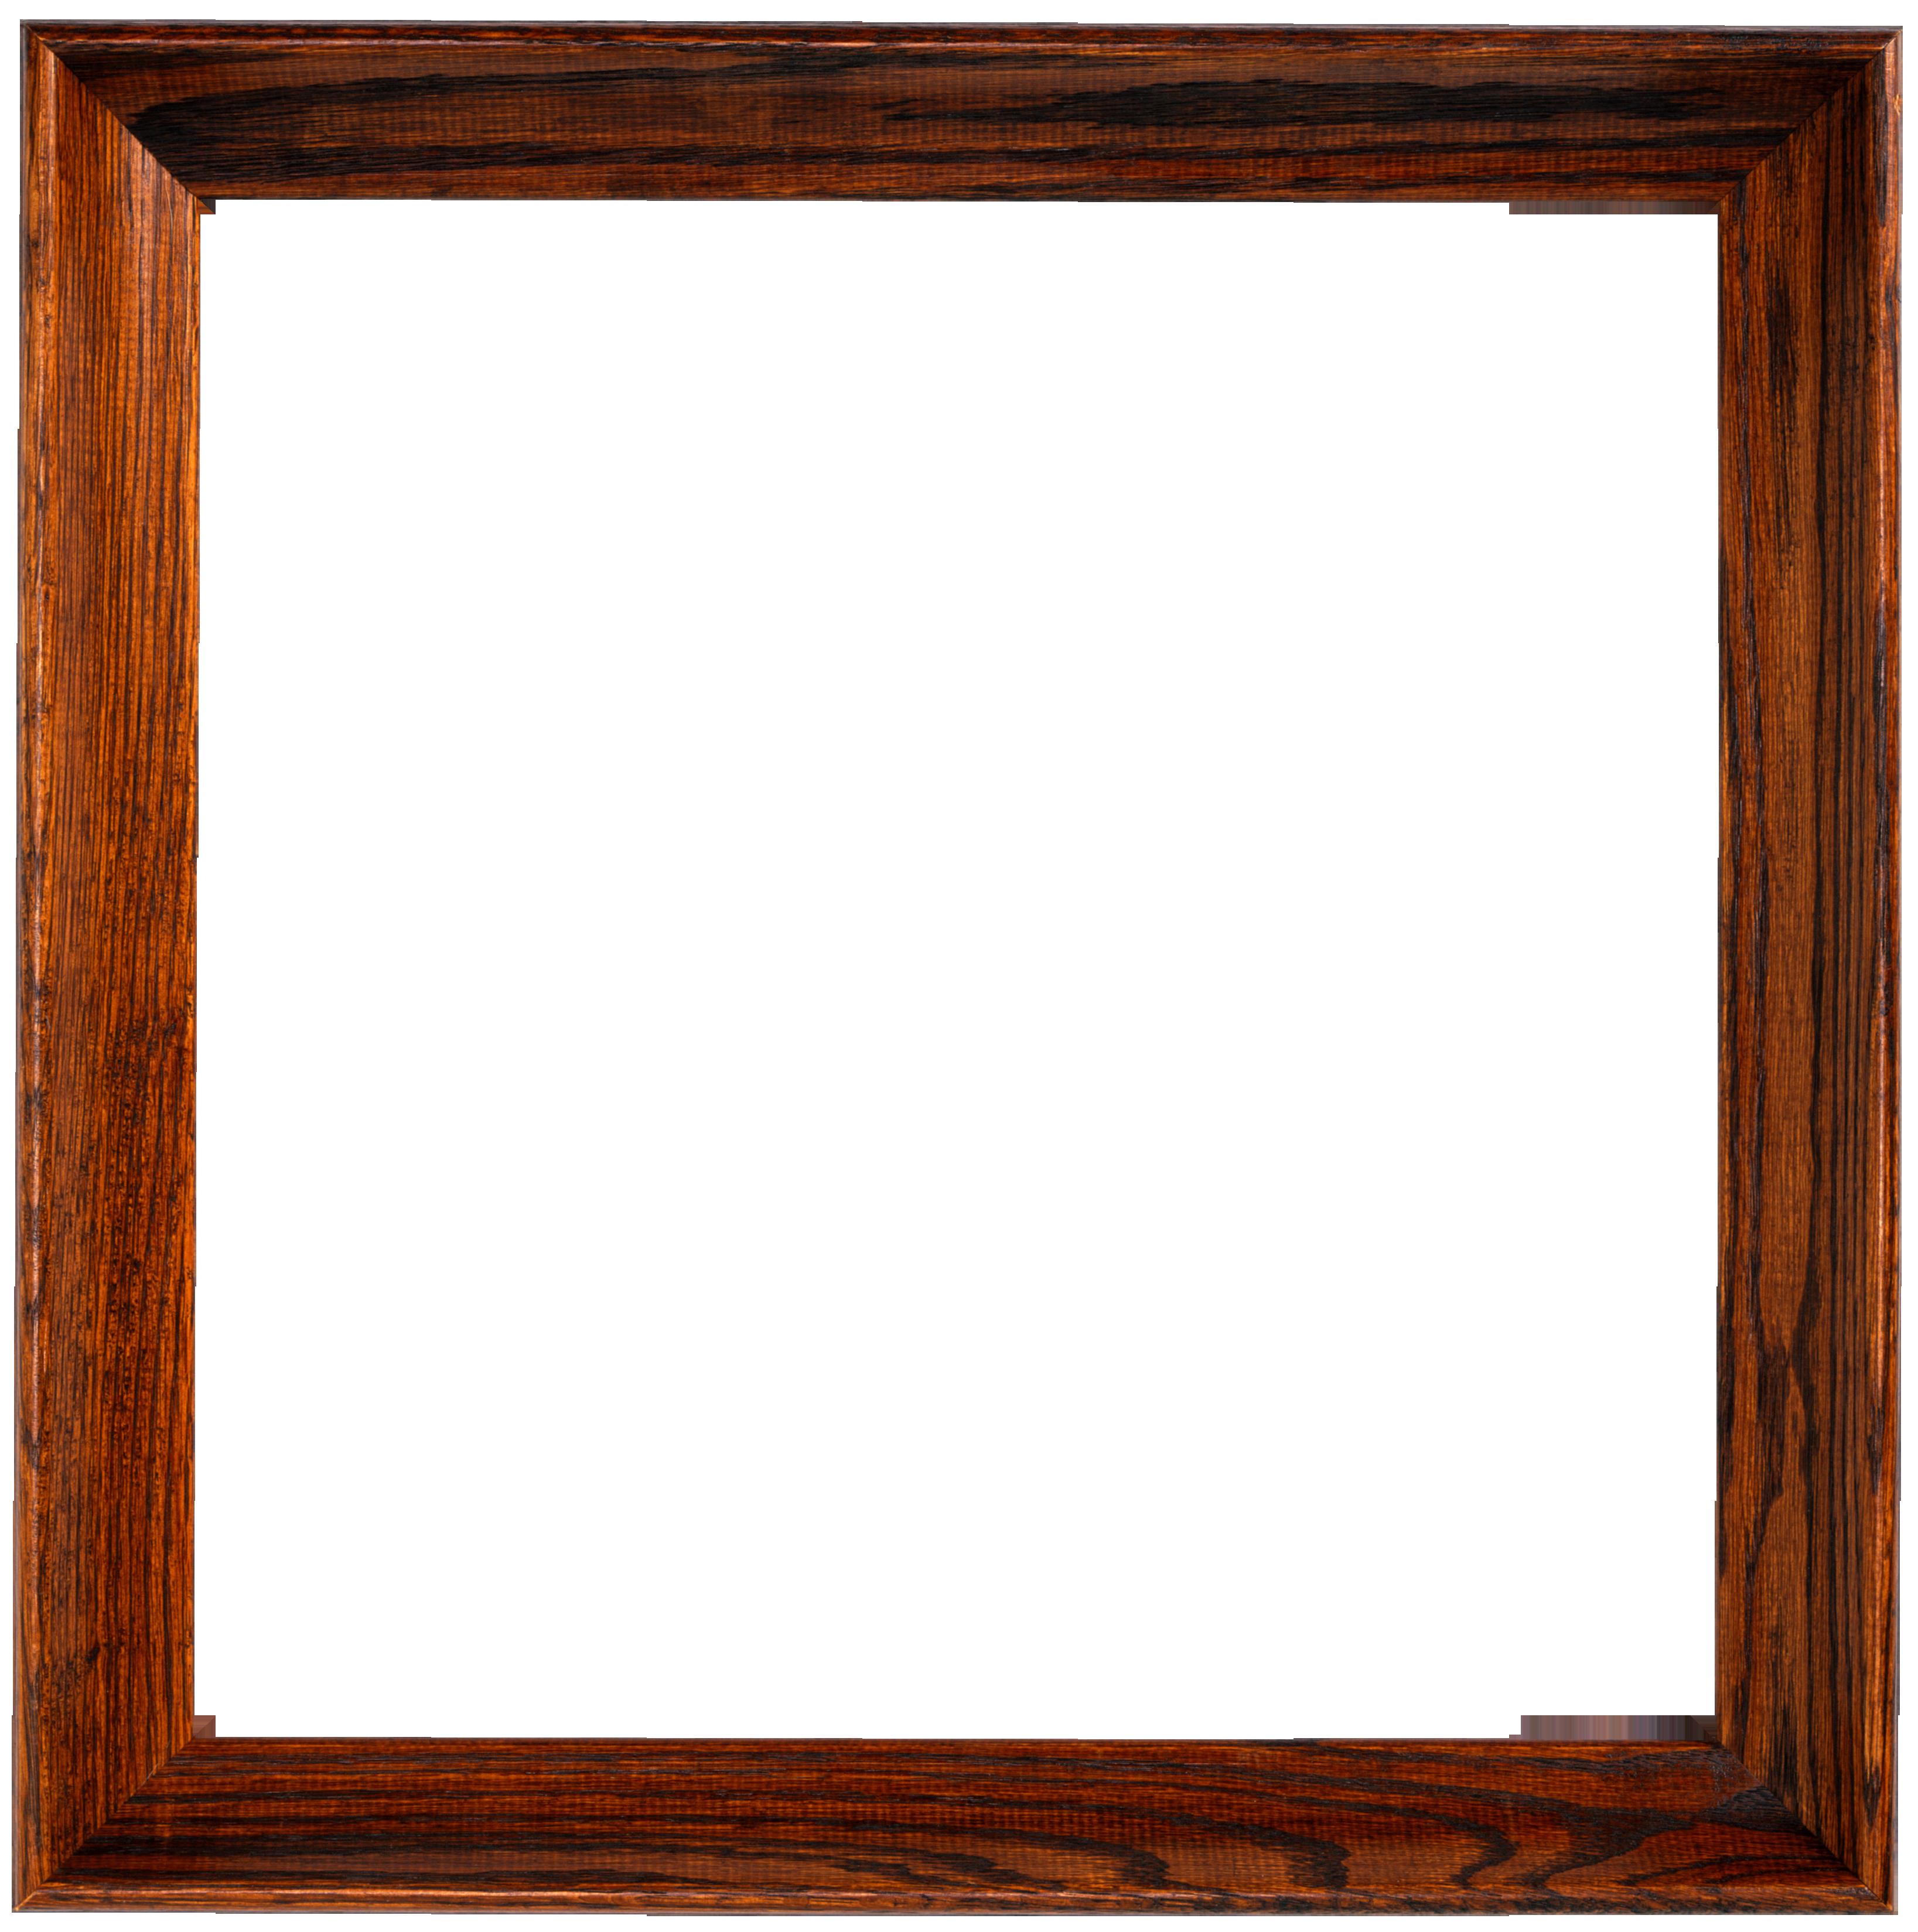 Рамки деревянные, железные ...: kira-scrap.ru/dir/ramki/ramki_derevjannye_i_zheleznye/352-4-2